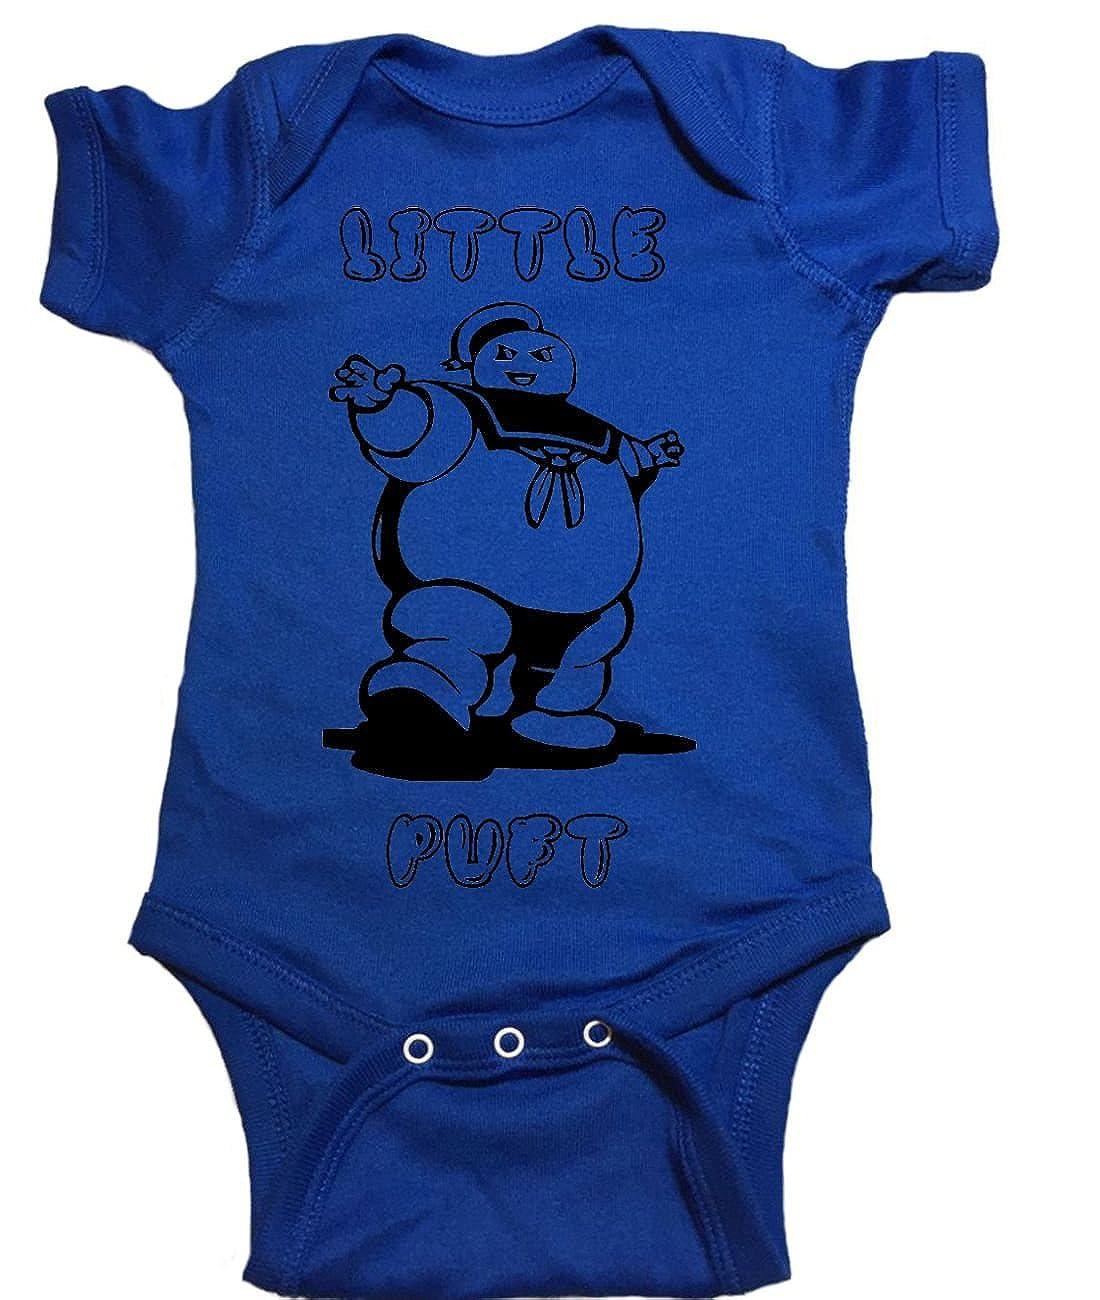 NorthStarTees Ghostbusters One Piece Little Puft Bodysuit